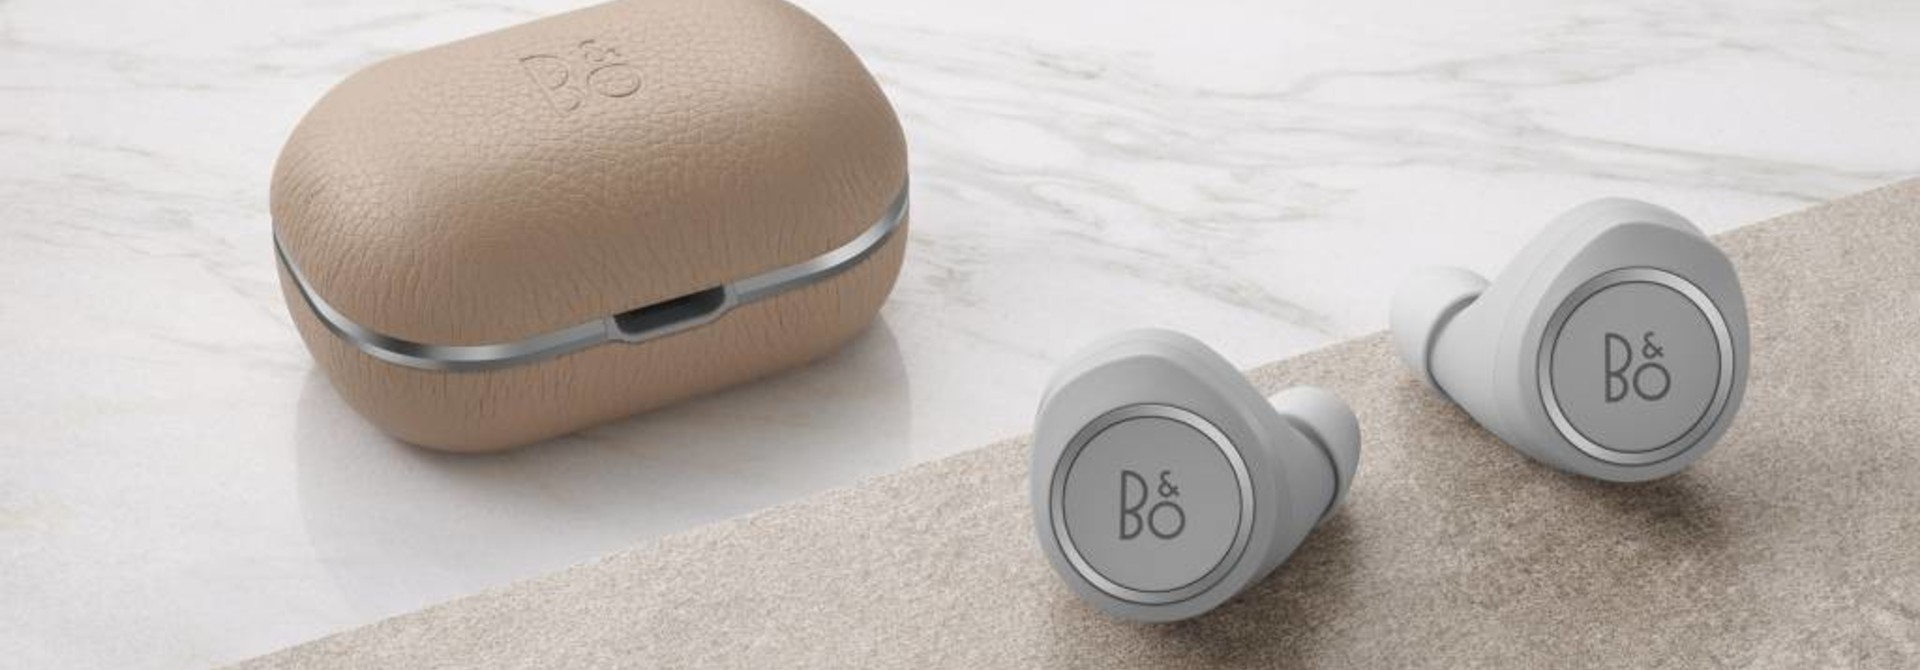 Bang & Olufsen Beoplay E8 2.0